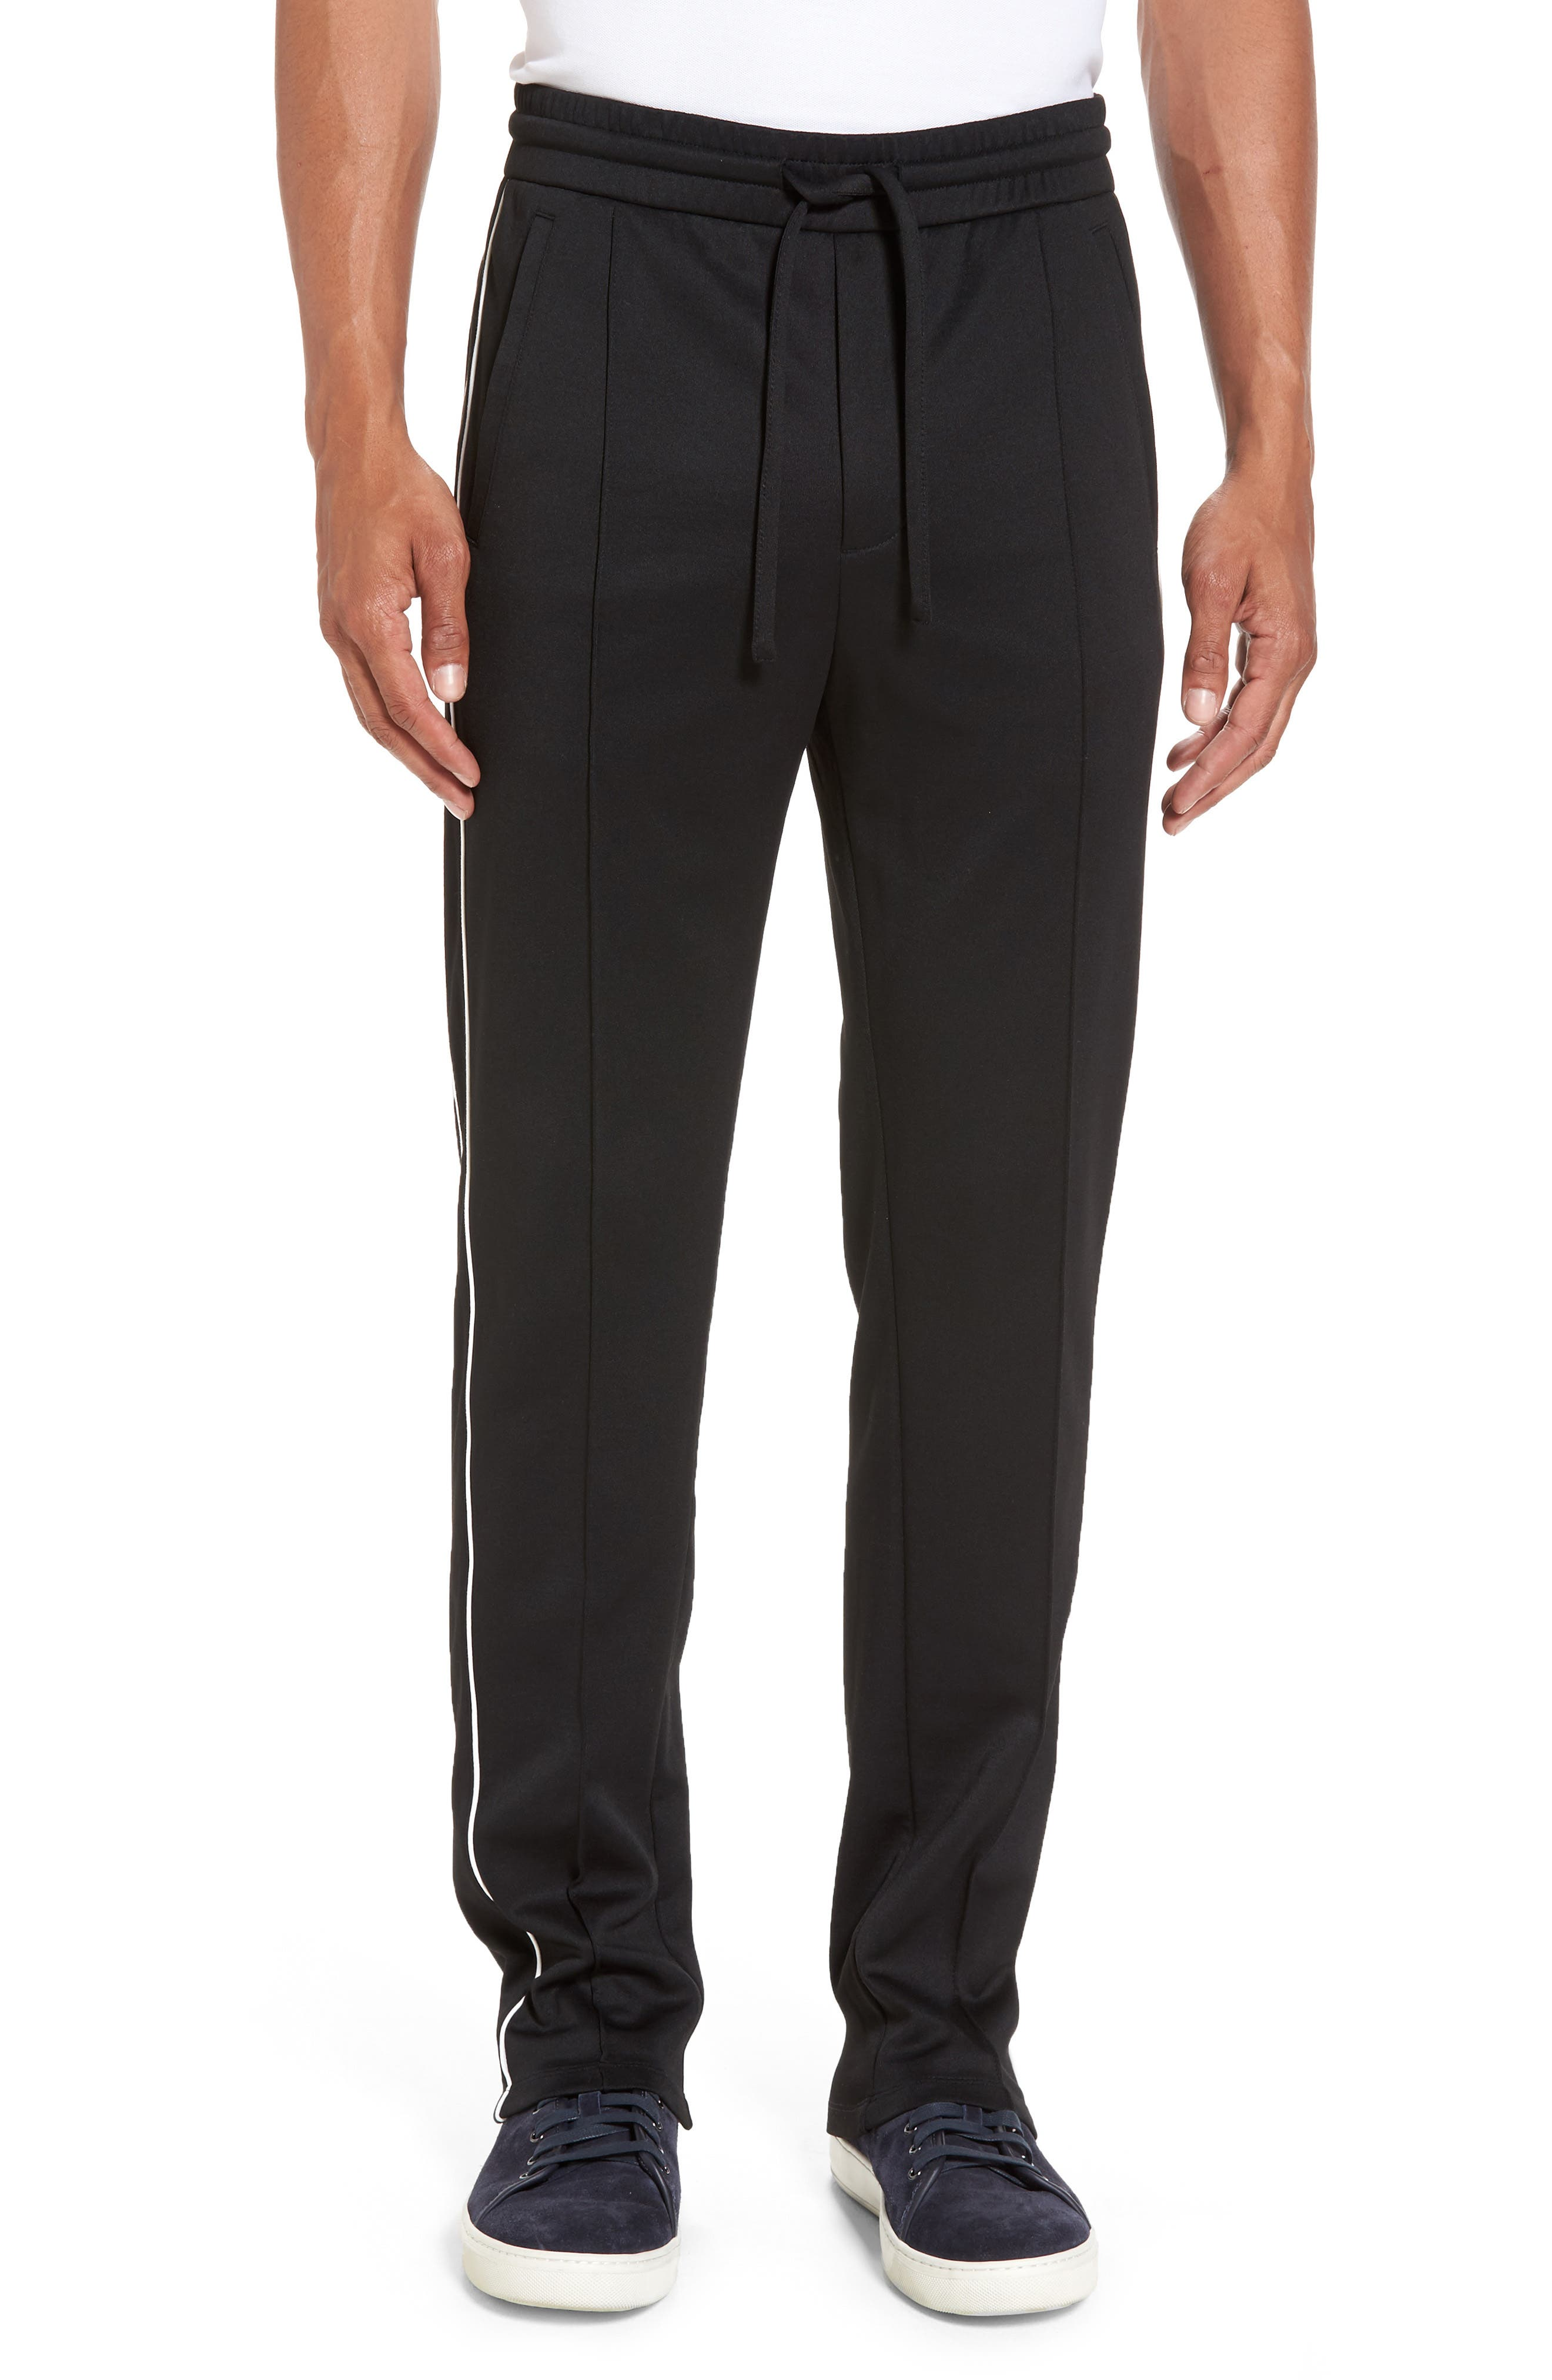 Alternate Image 1 Selected - Vince Slim Fit Track Pants